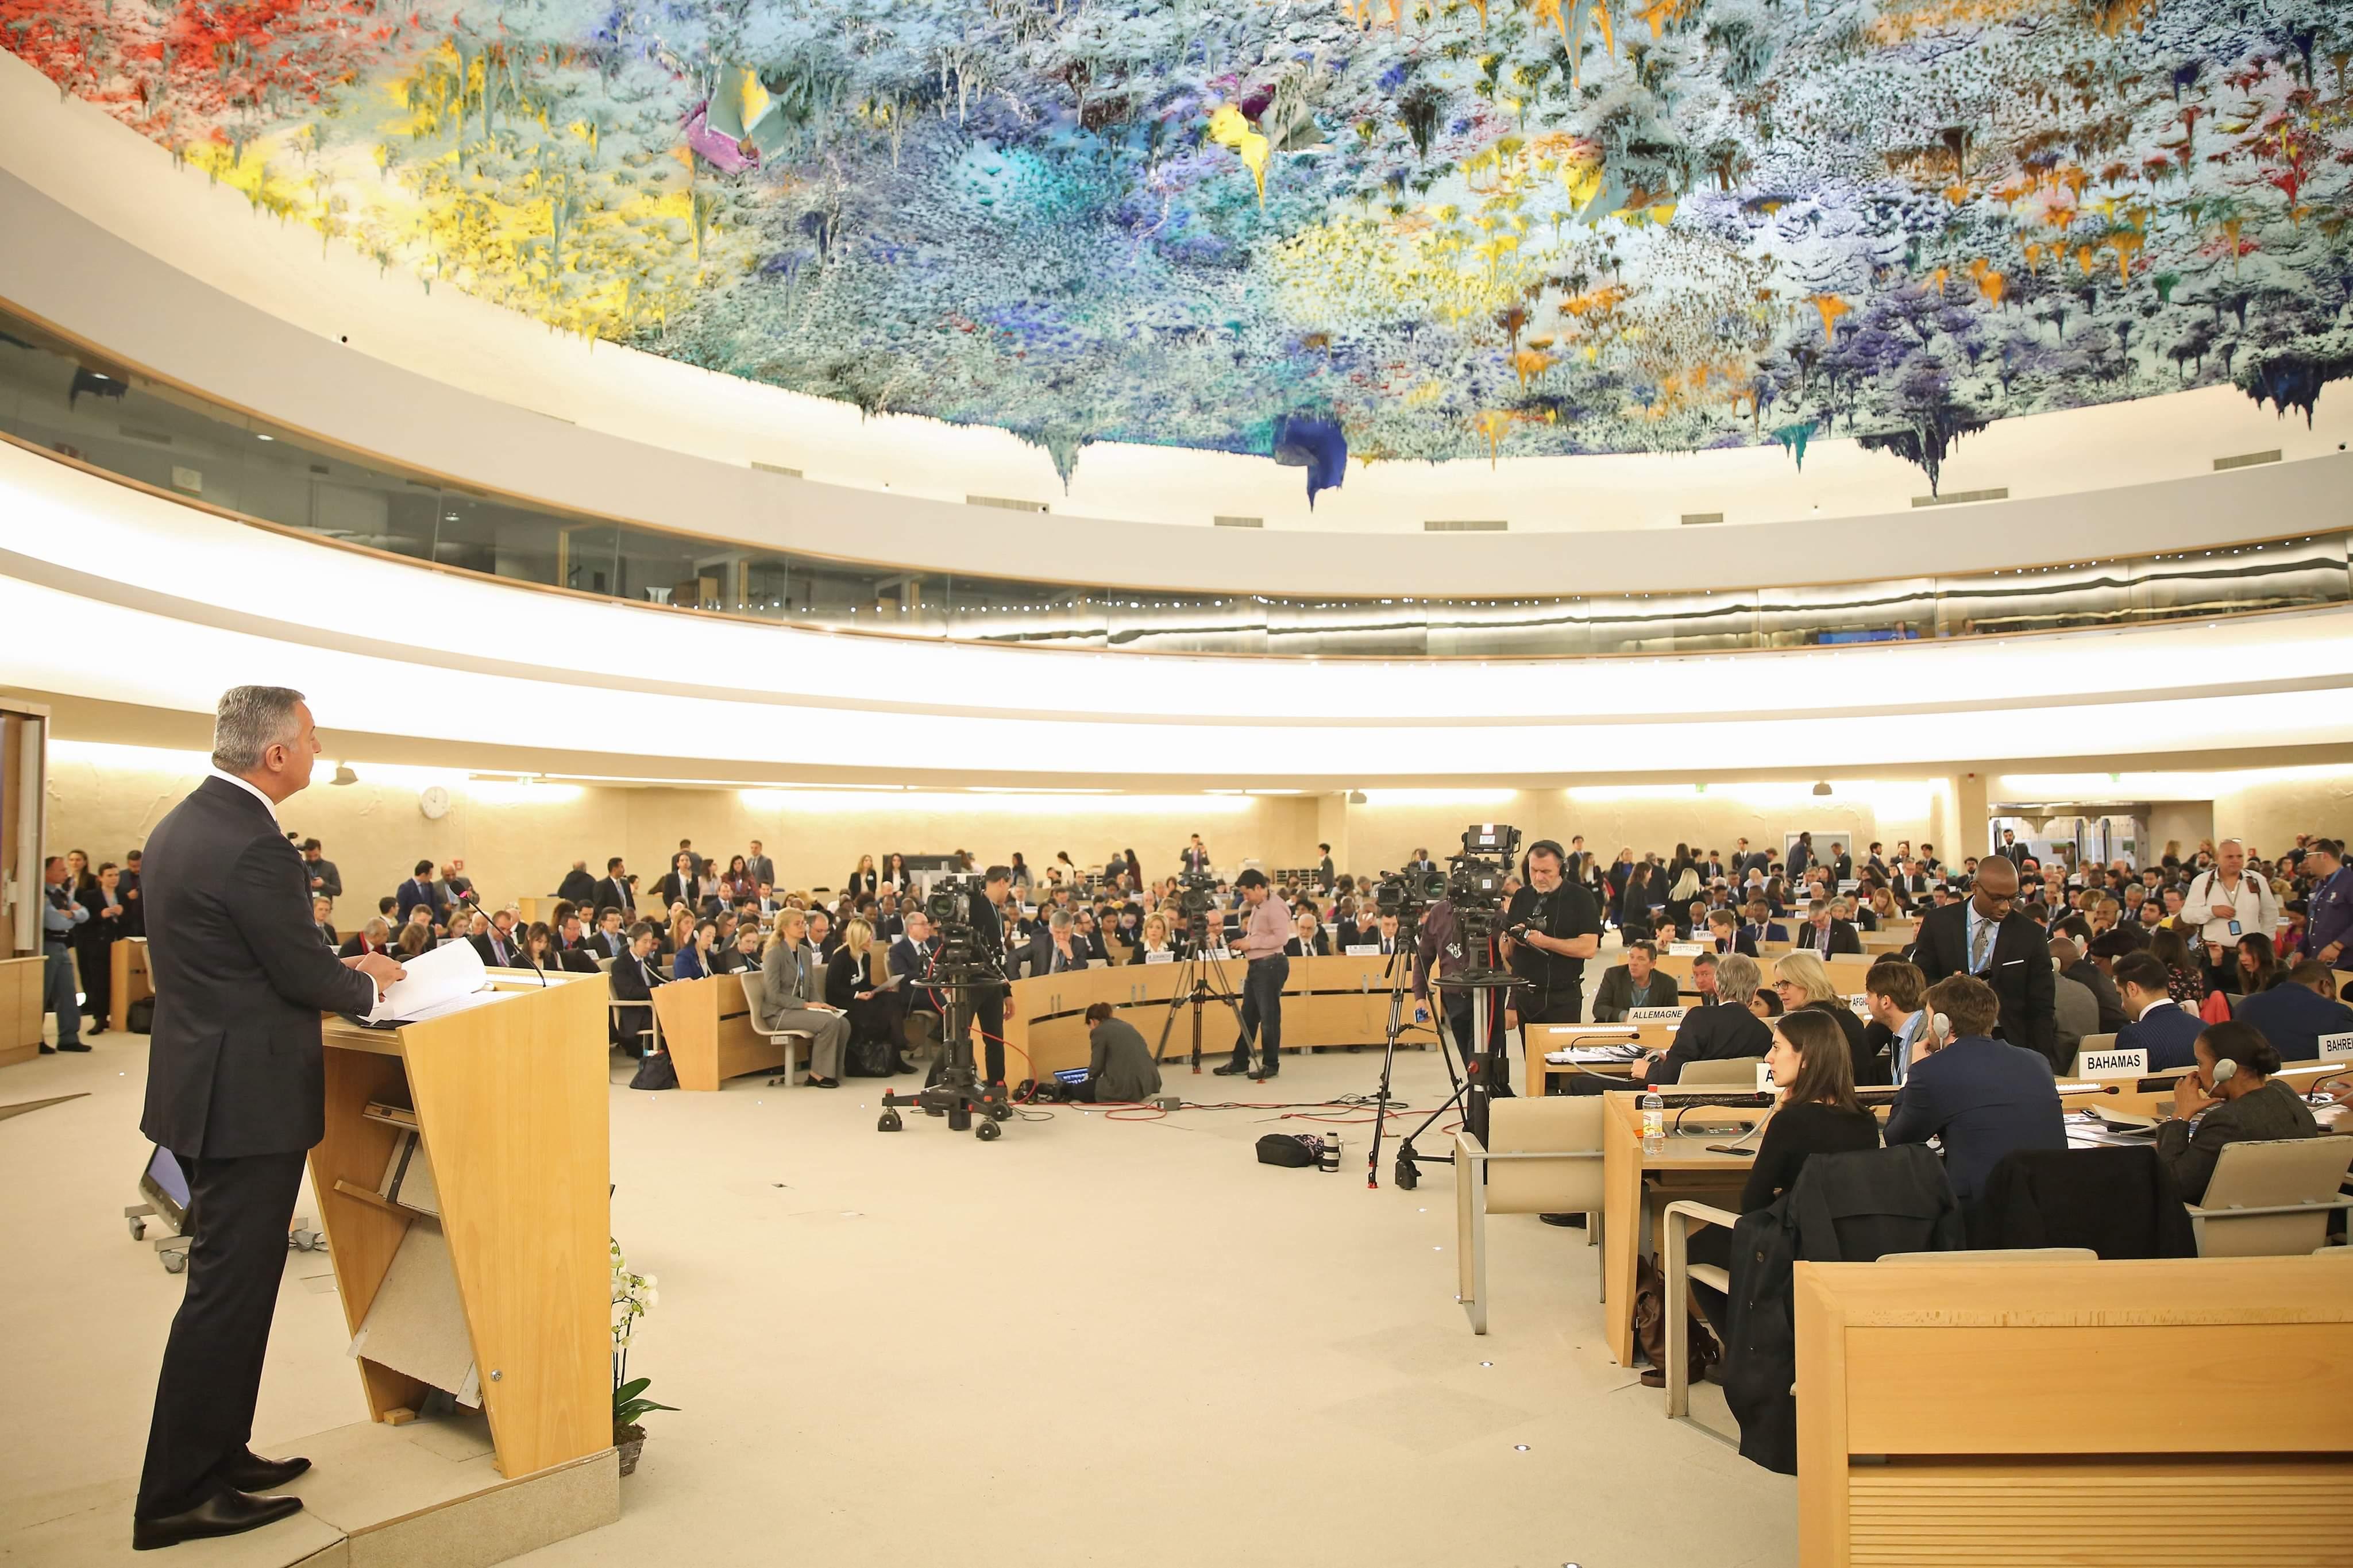 Đukanović στη 43η Σύνοδο του Συμβουλίου Ανθρώπινων Δικαιωμάτων του ΟΗΕ: Το Μαυροβούνιο δέχεται επίθεση